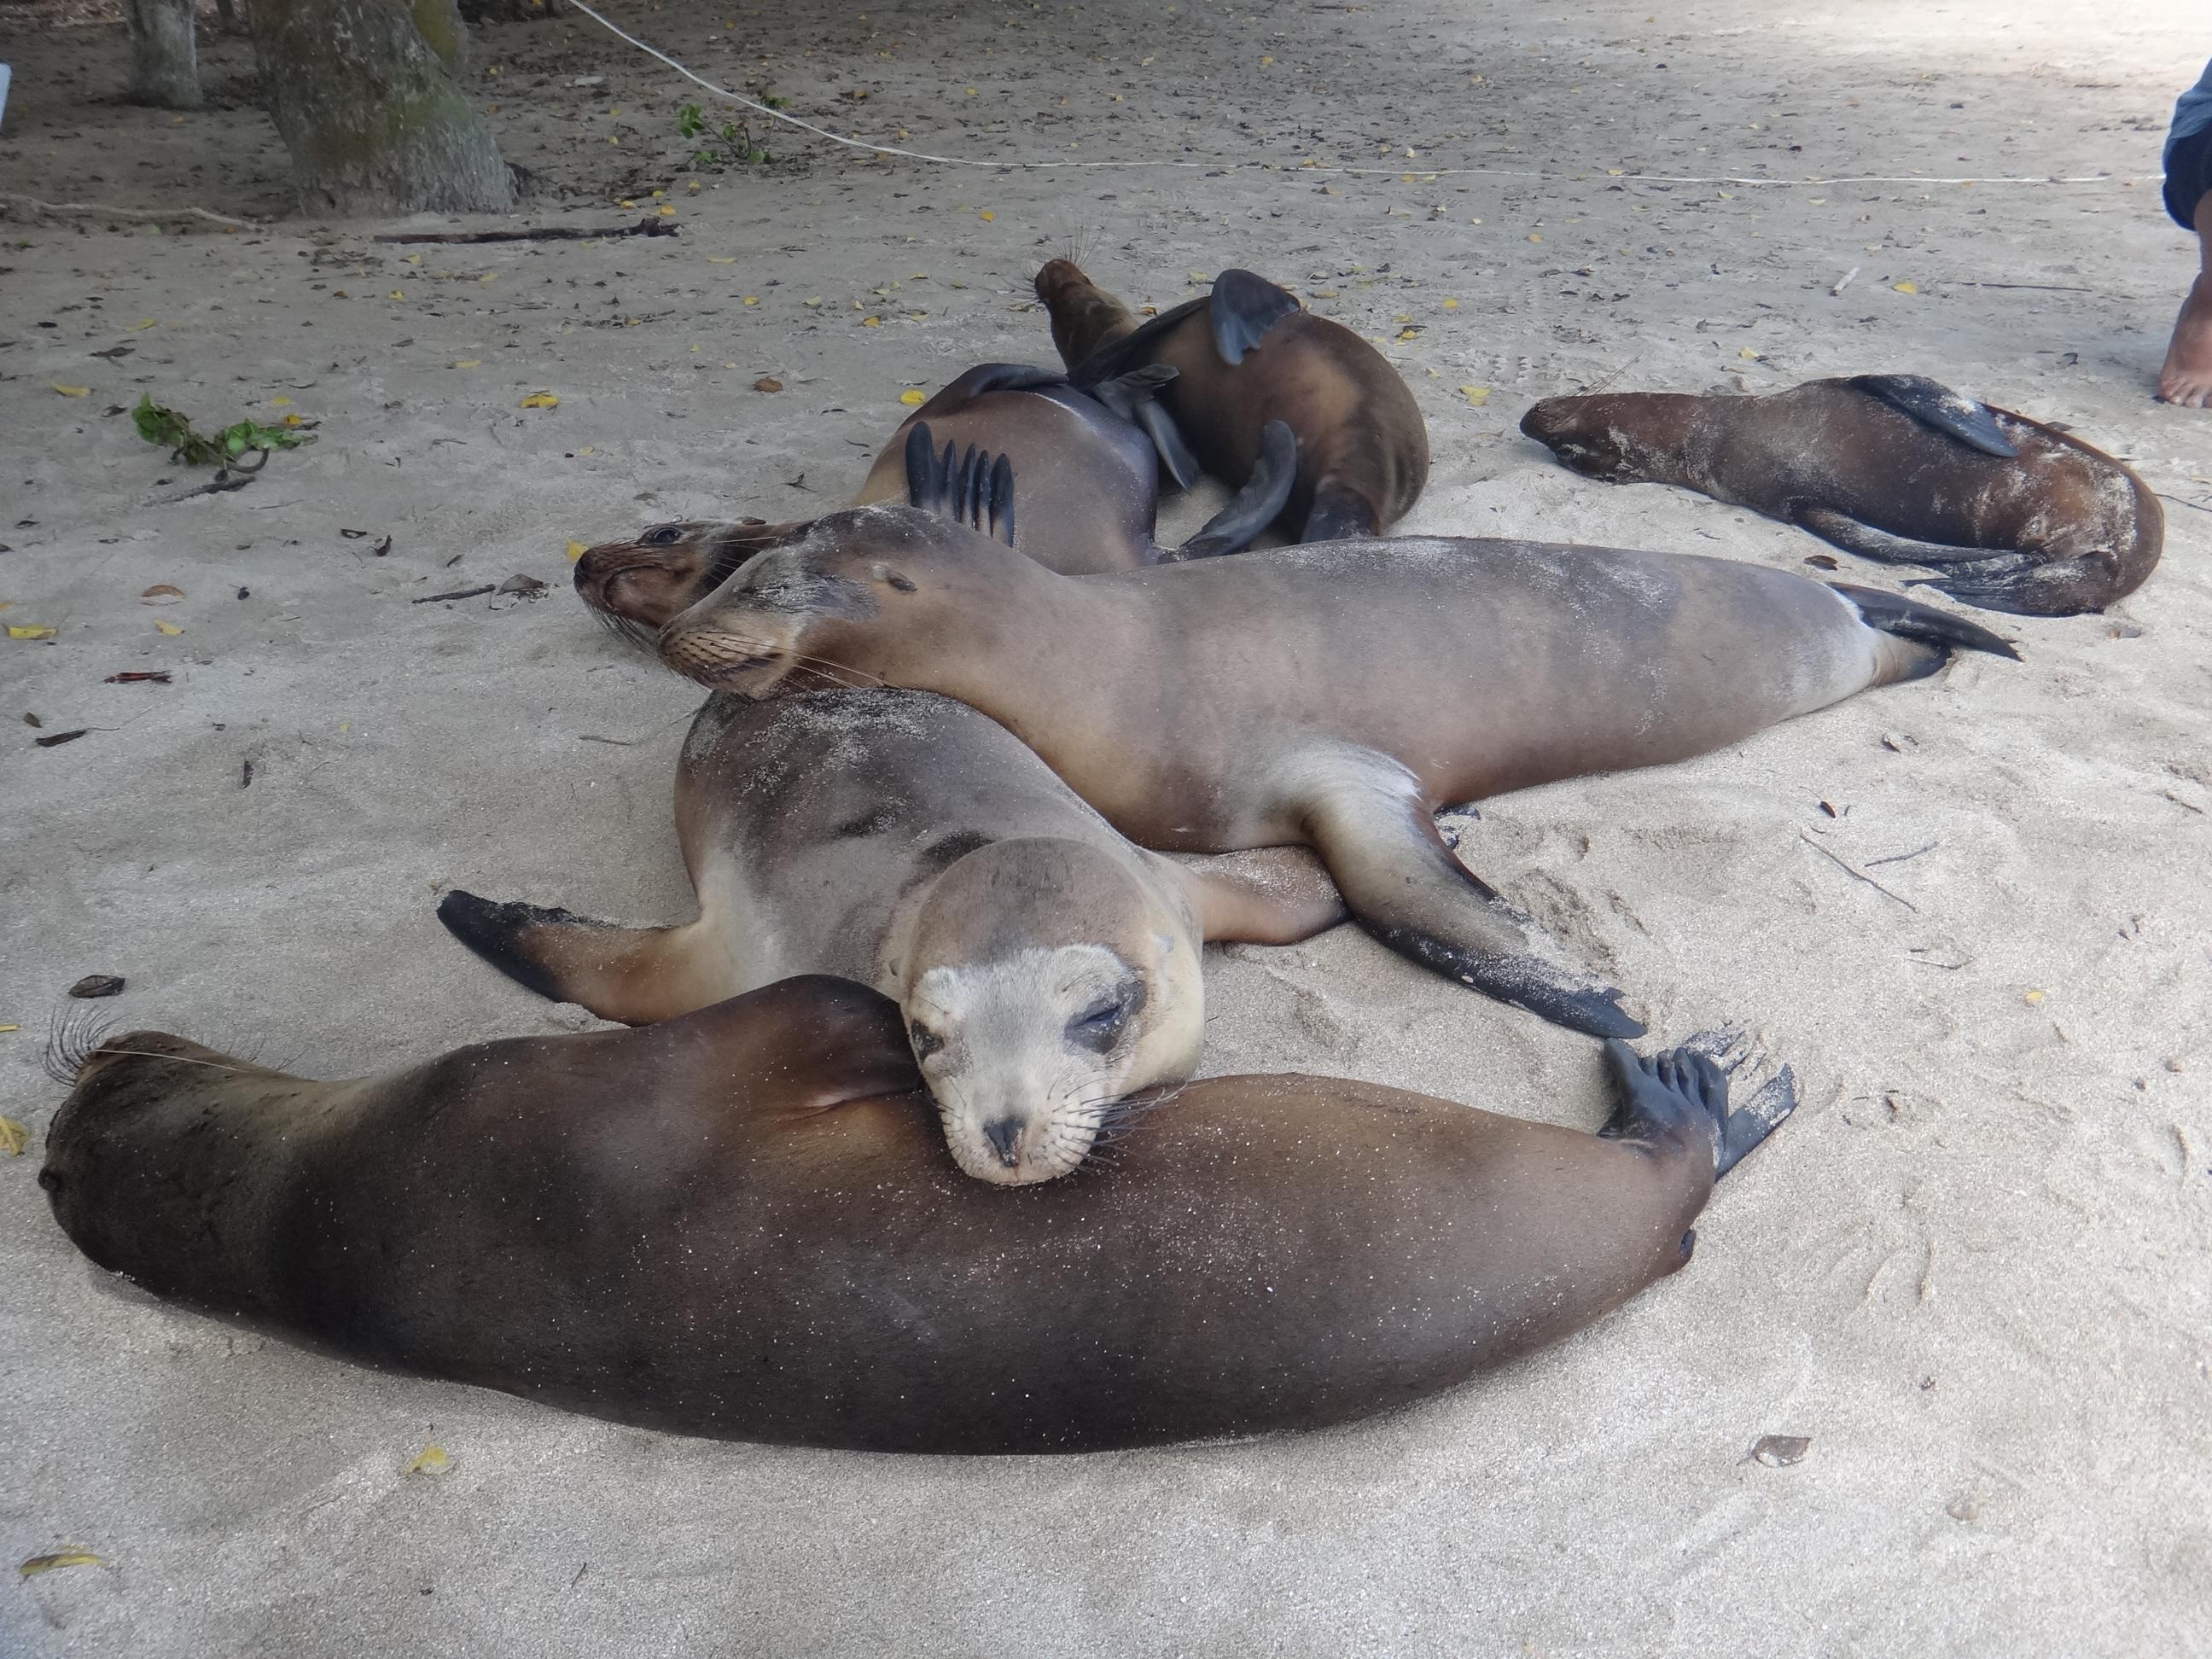 Ecuador_Galapagos Islands_Isla Isabela_Sea Lions lazing about playa near port in Puerto Villamil